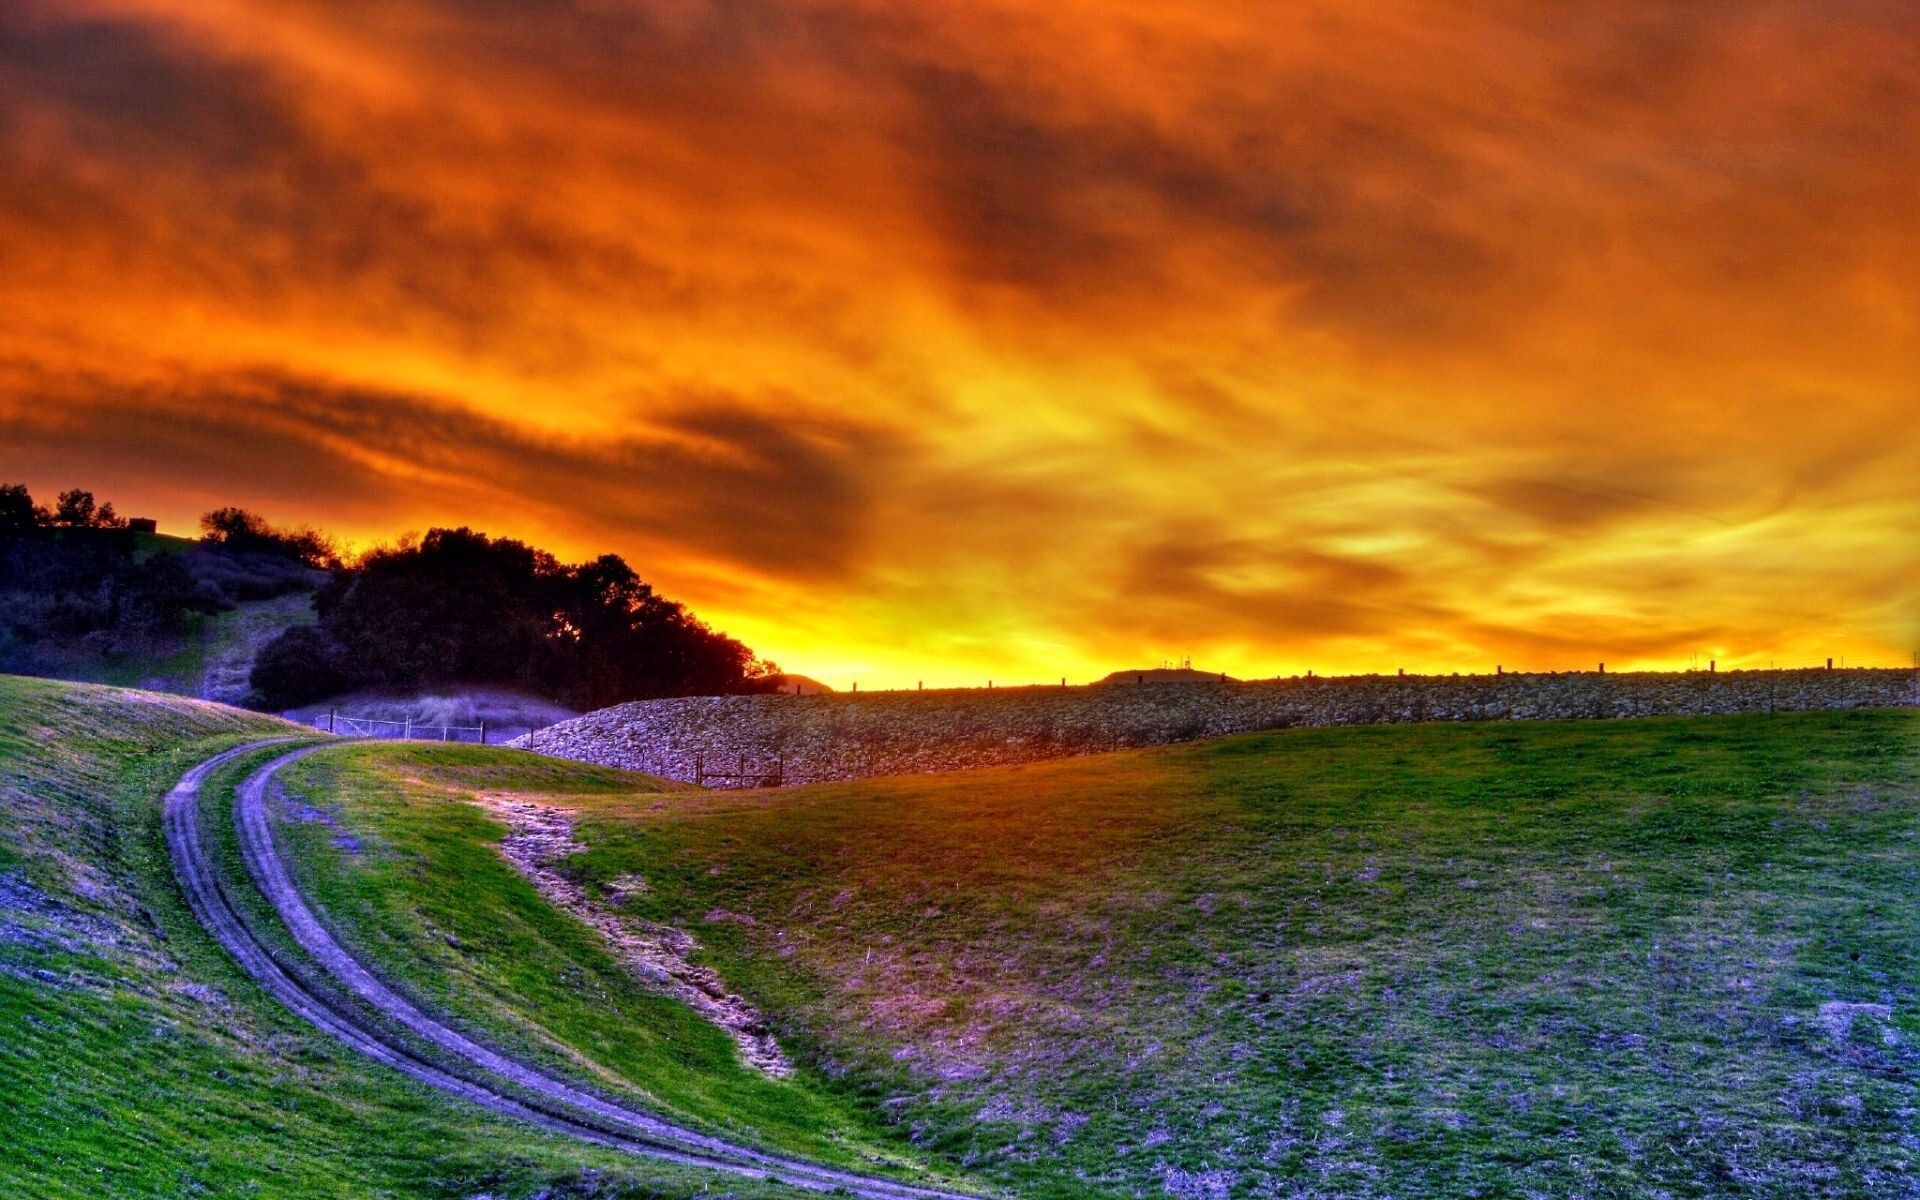 Hd wallpaper landscape - Best Nature Hd Landscape Wallpaper Hd Wallpapers